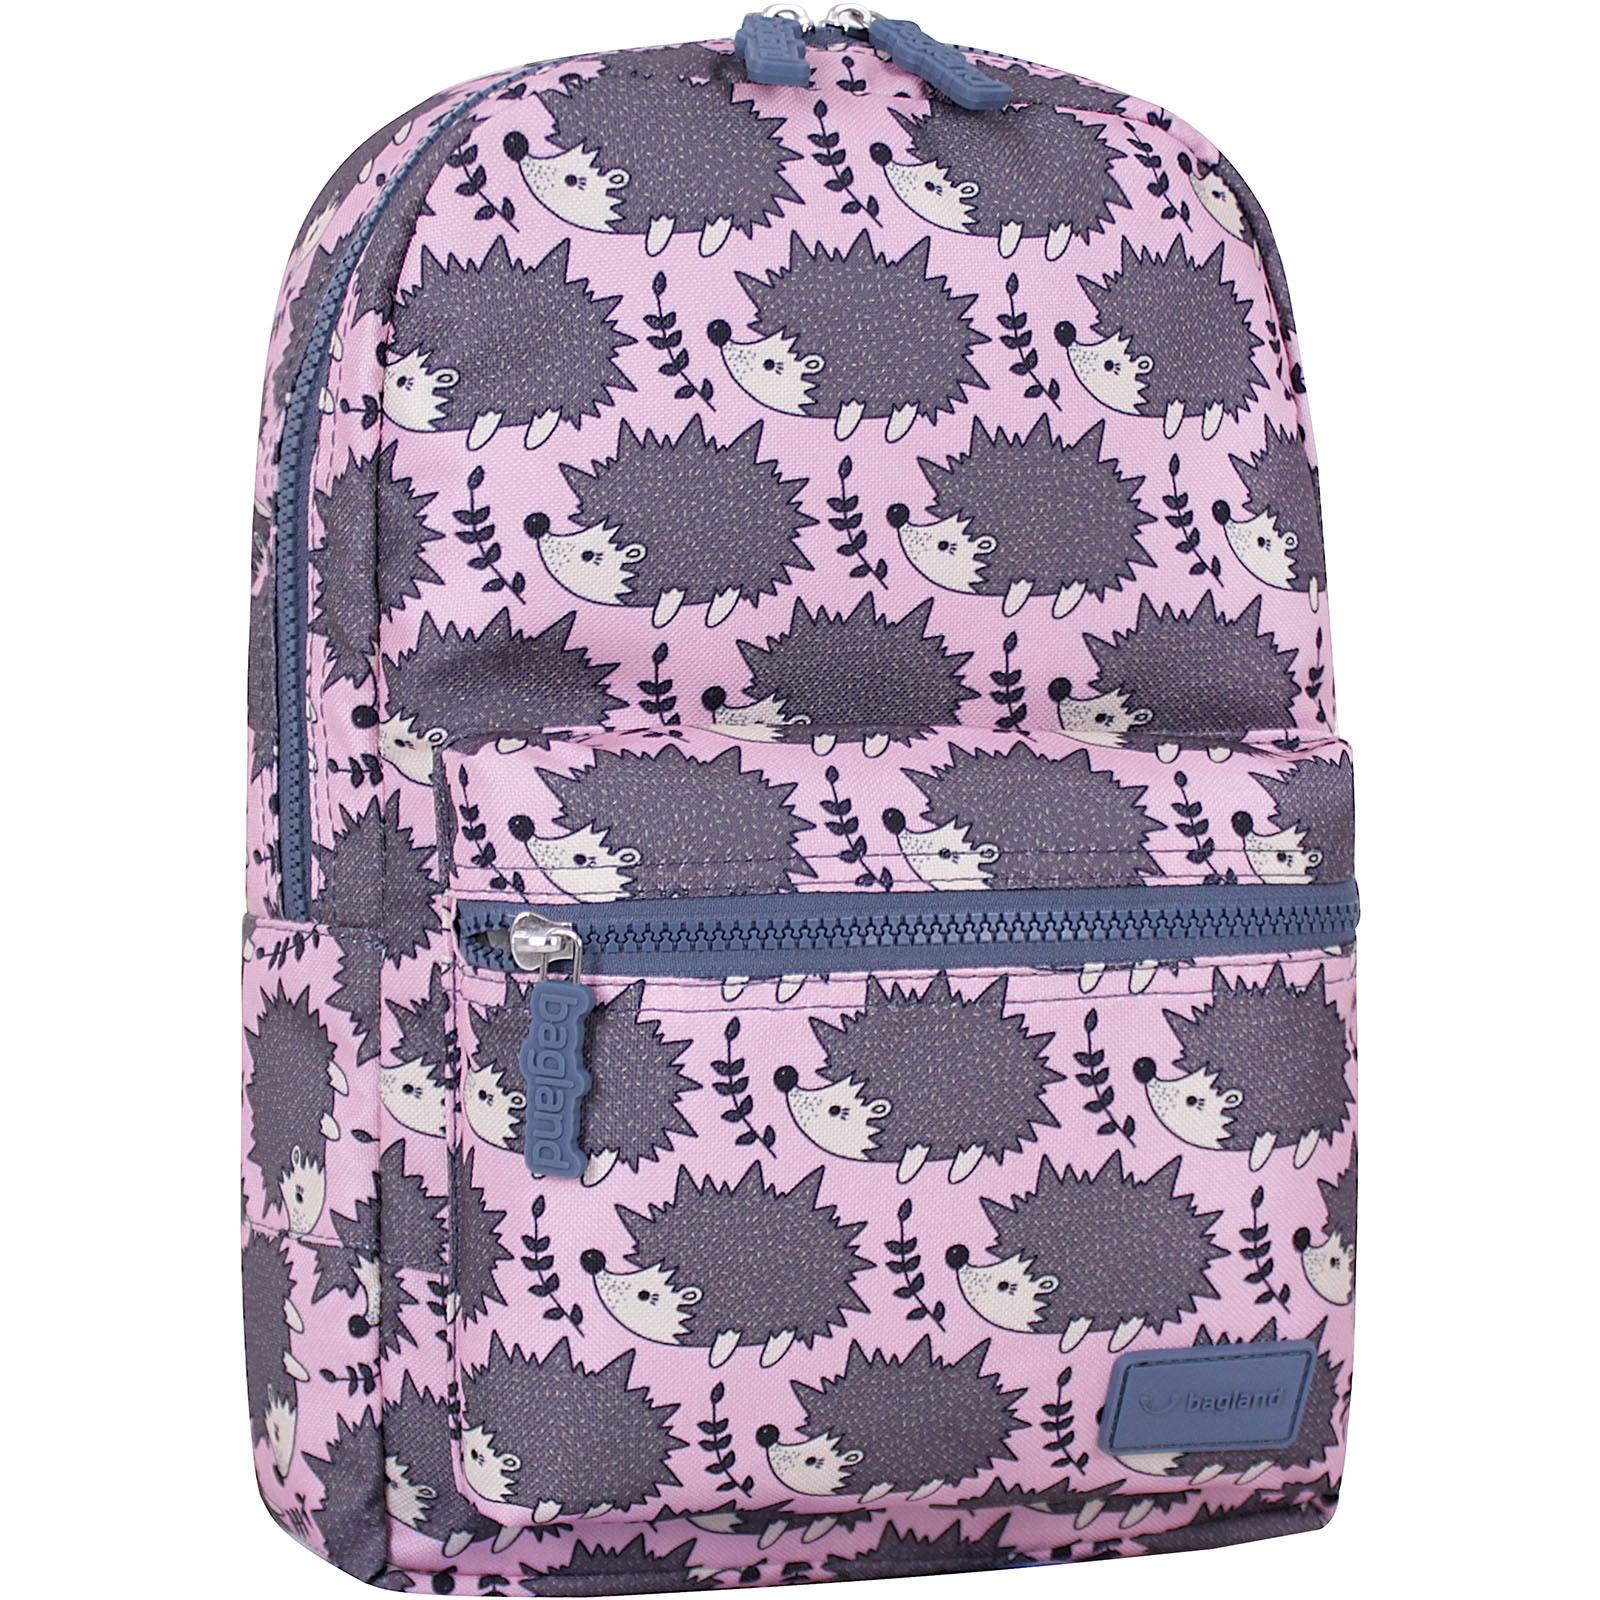 Молодежные рюкзаки Рюкзак Bagland Молодежный mini 8 л. сублимация 485 (00508664) IMG_9515_суб.485_.JPG